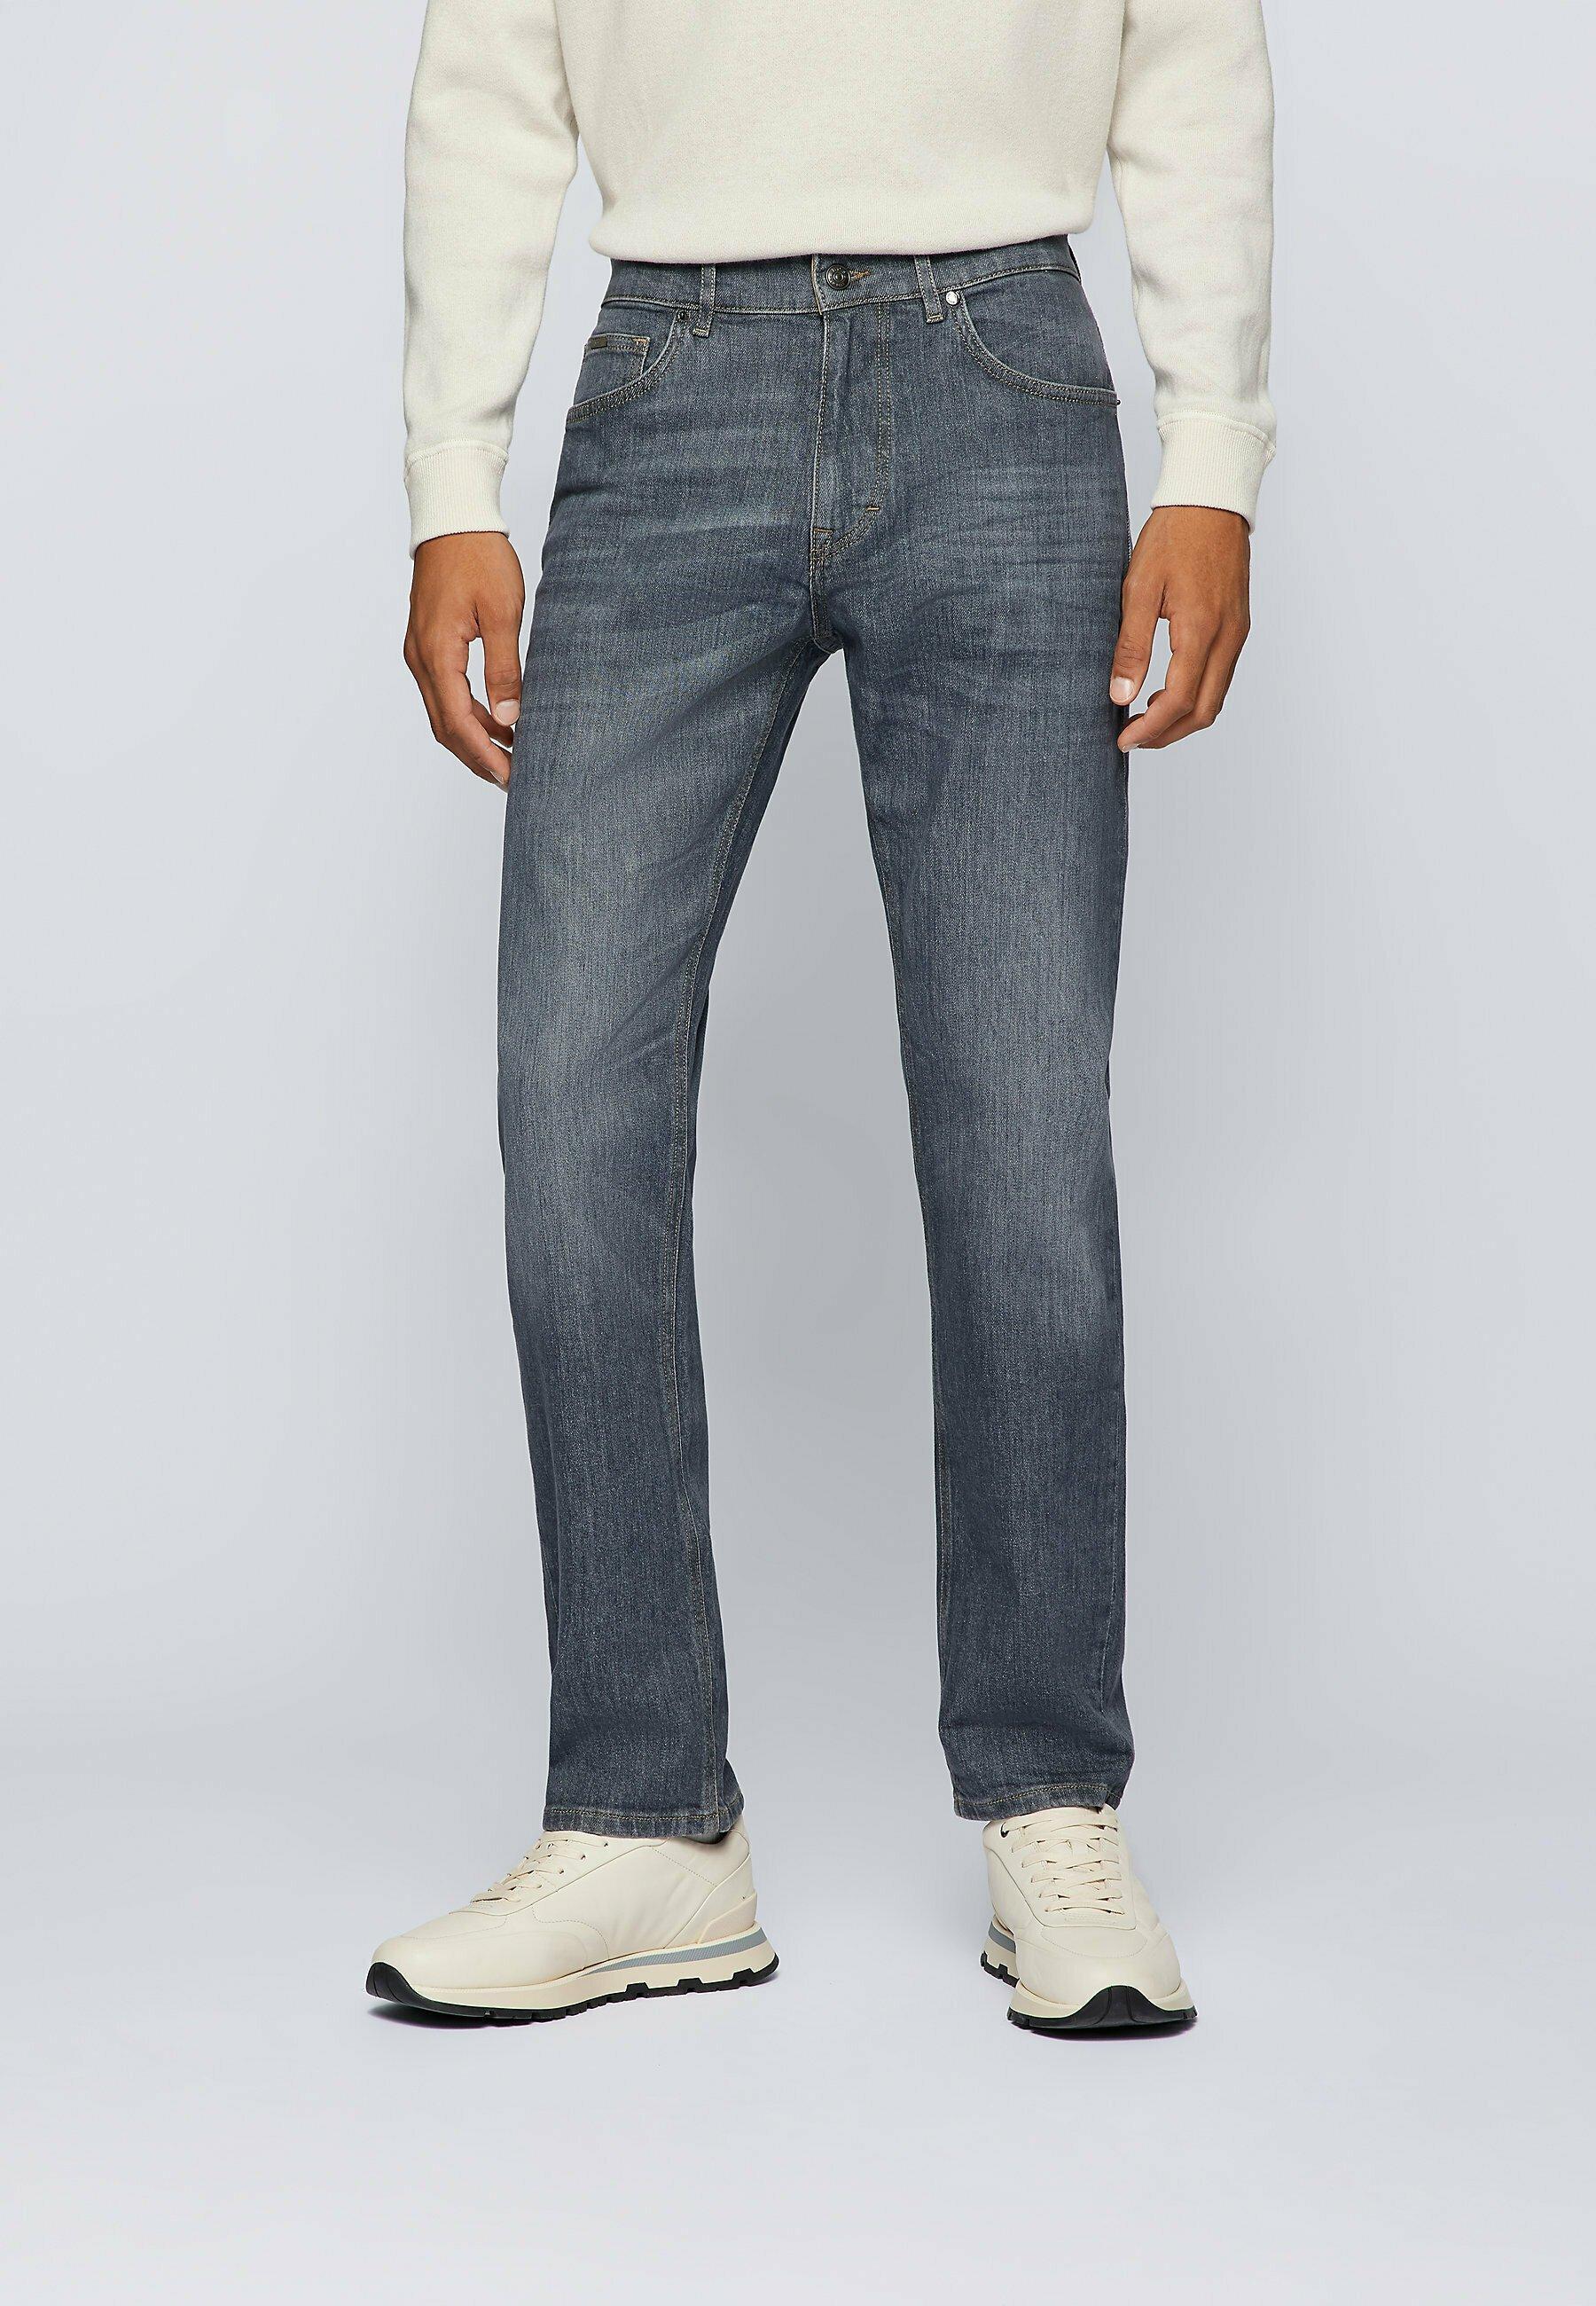 Uomo ALBANY - Jeans slim fit